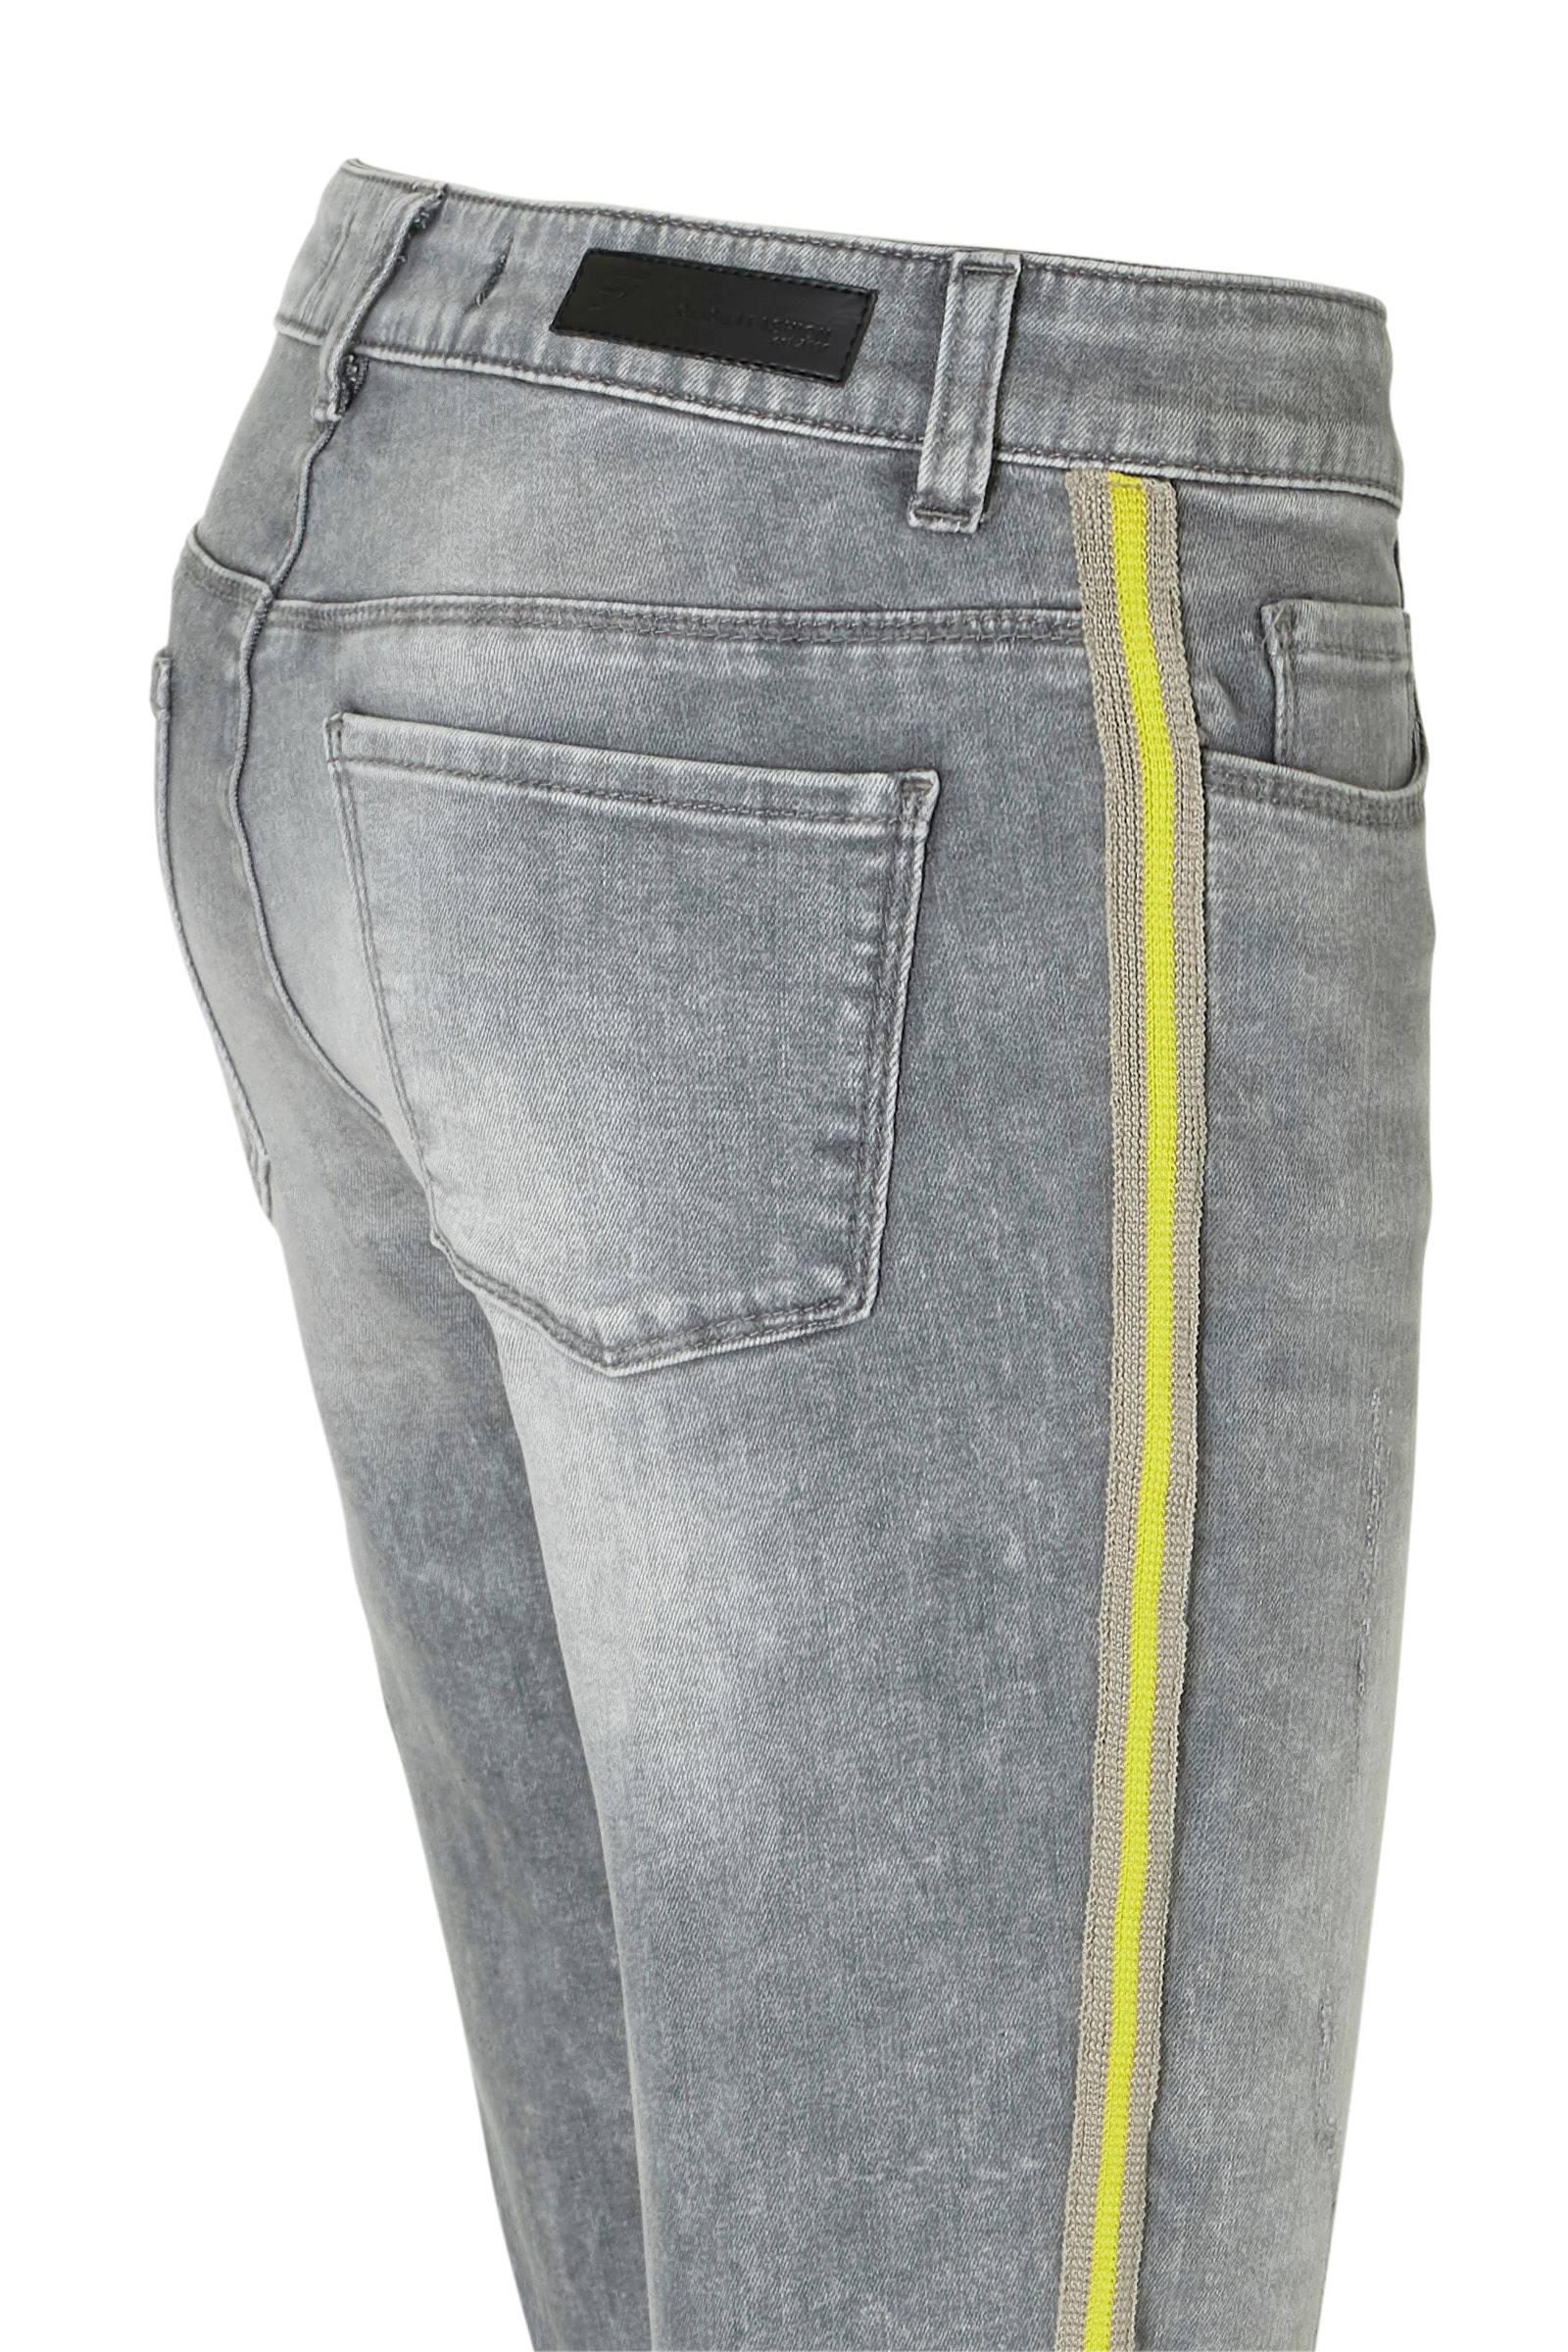 Geisha skinny jeans grijs